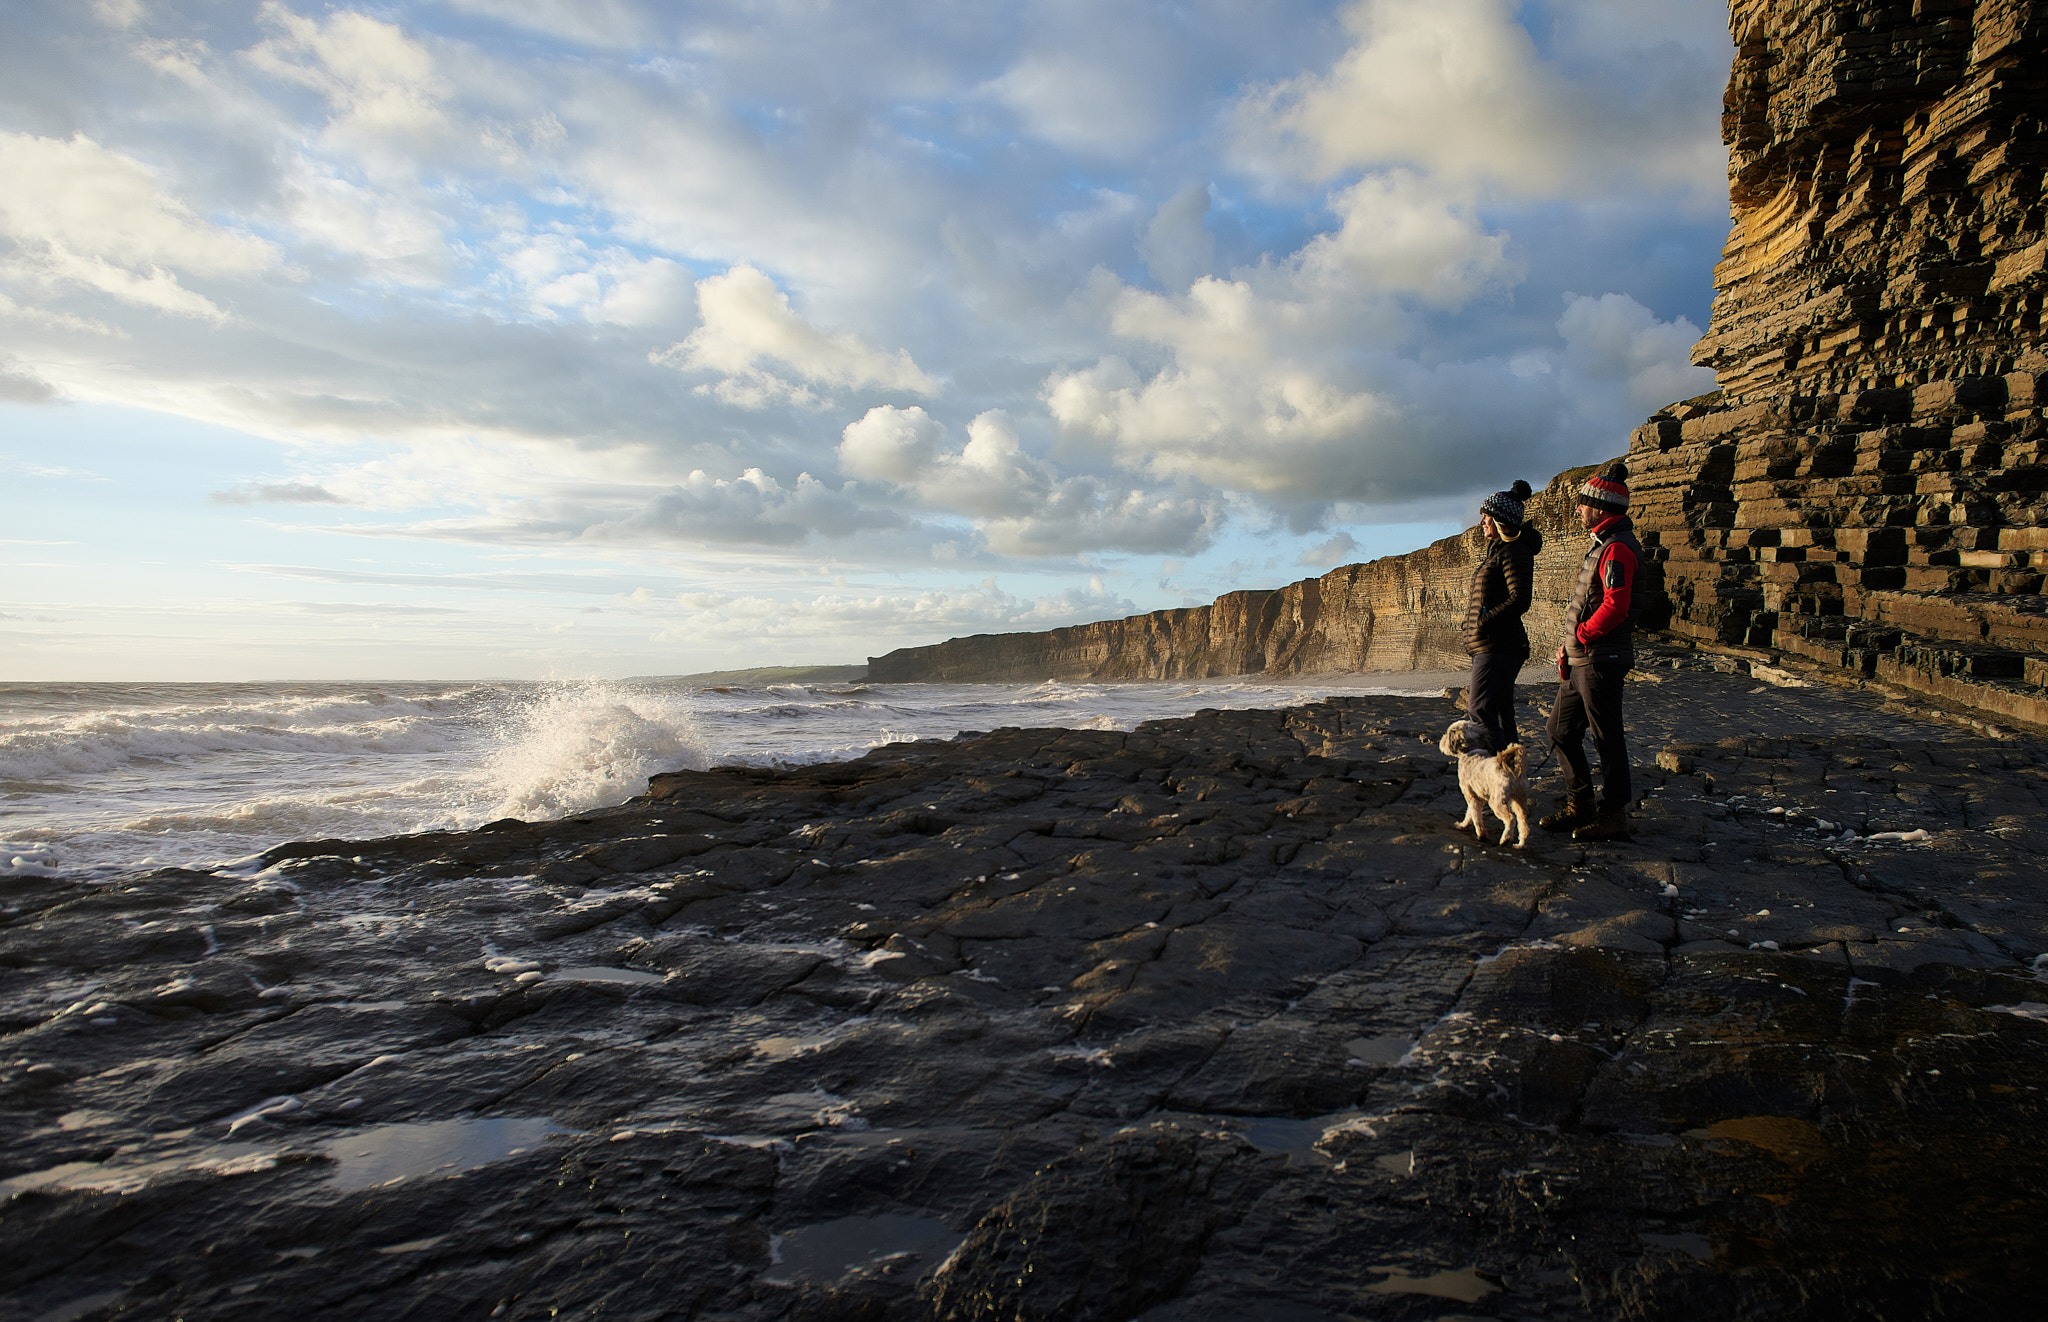 Llantwit Major & the Glamorgan Heritage Coast